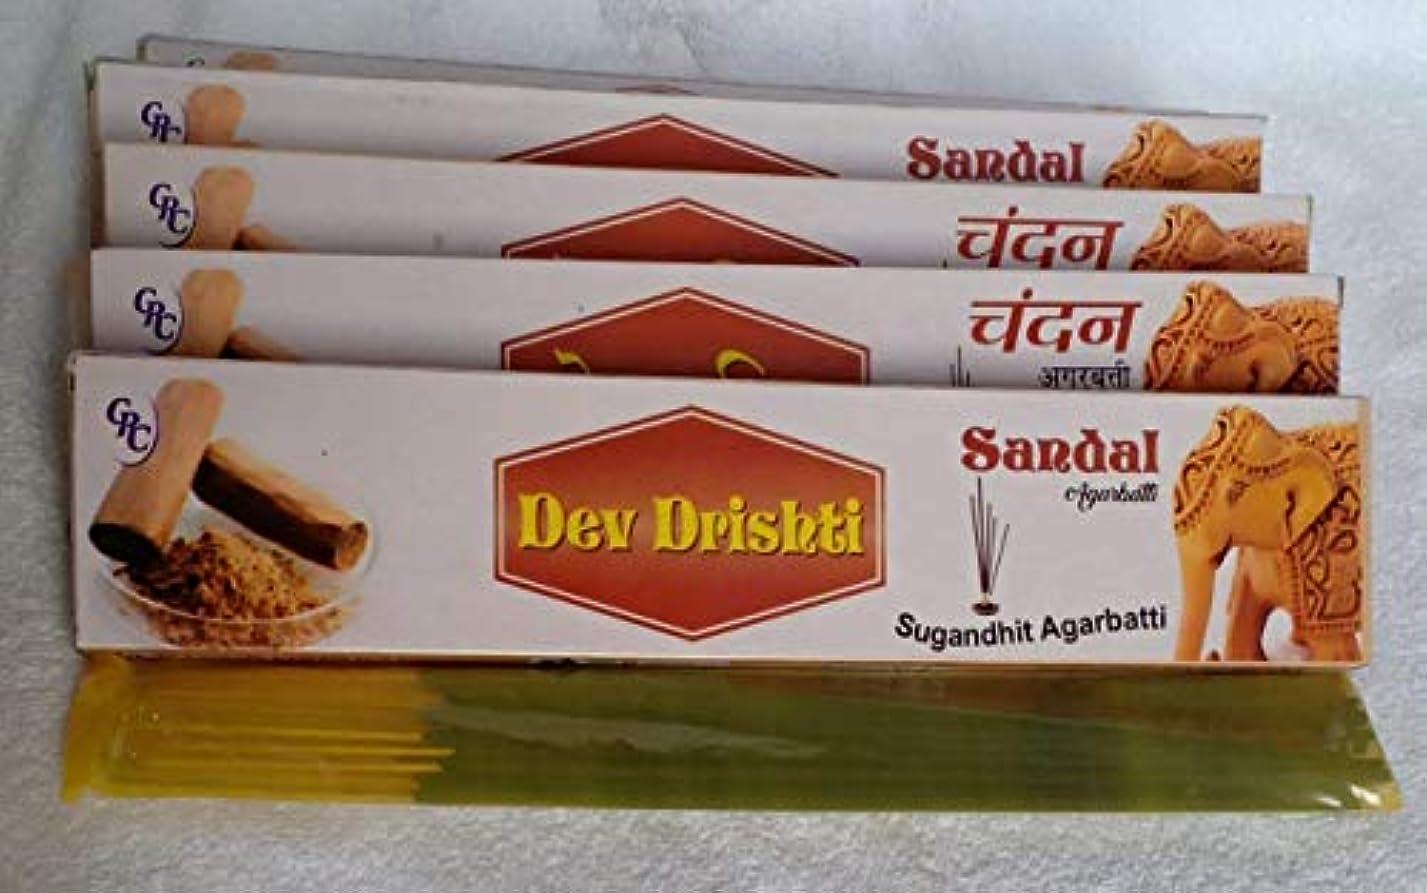 額面白い火傷Dev Drishti Sandal Agarbatti Pack Of 12 (Per Pack of 15 Sticks)